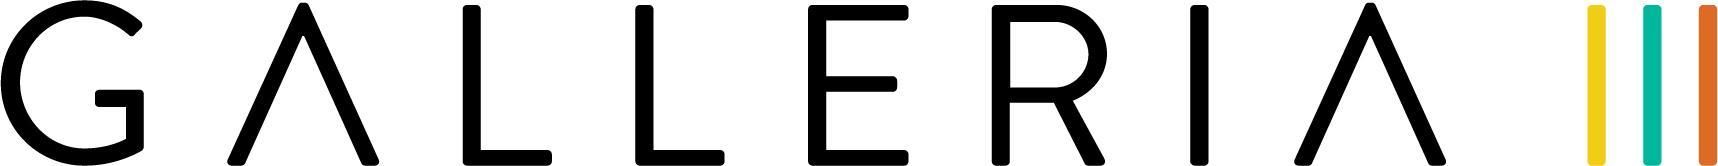 Galleria 3 condo logo